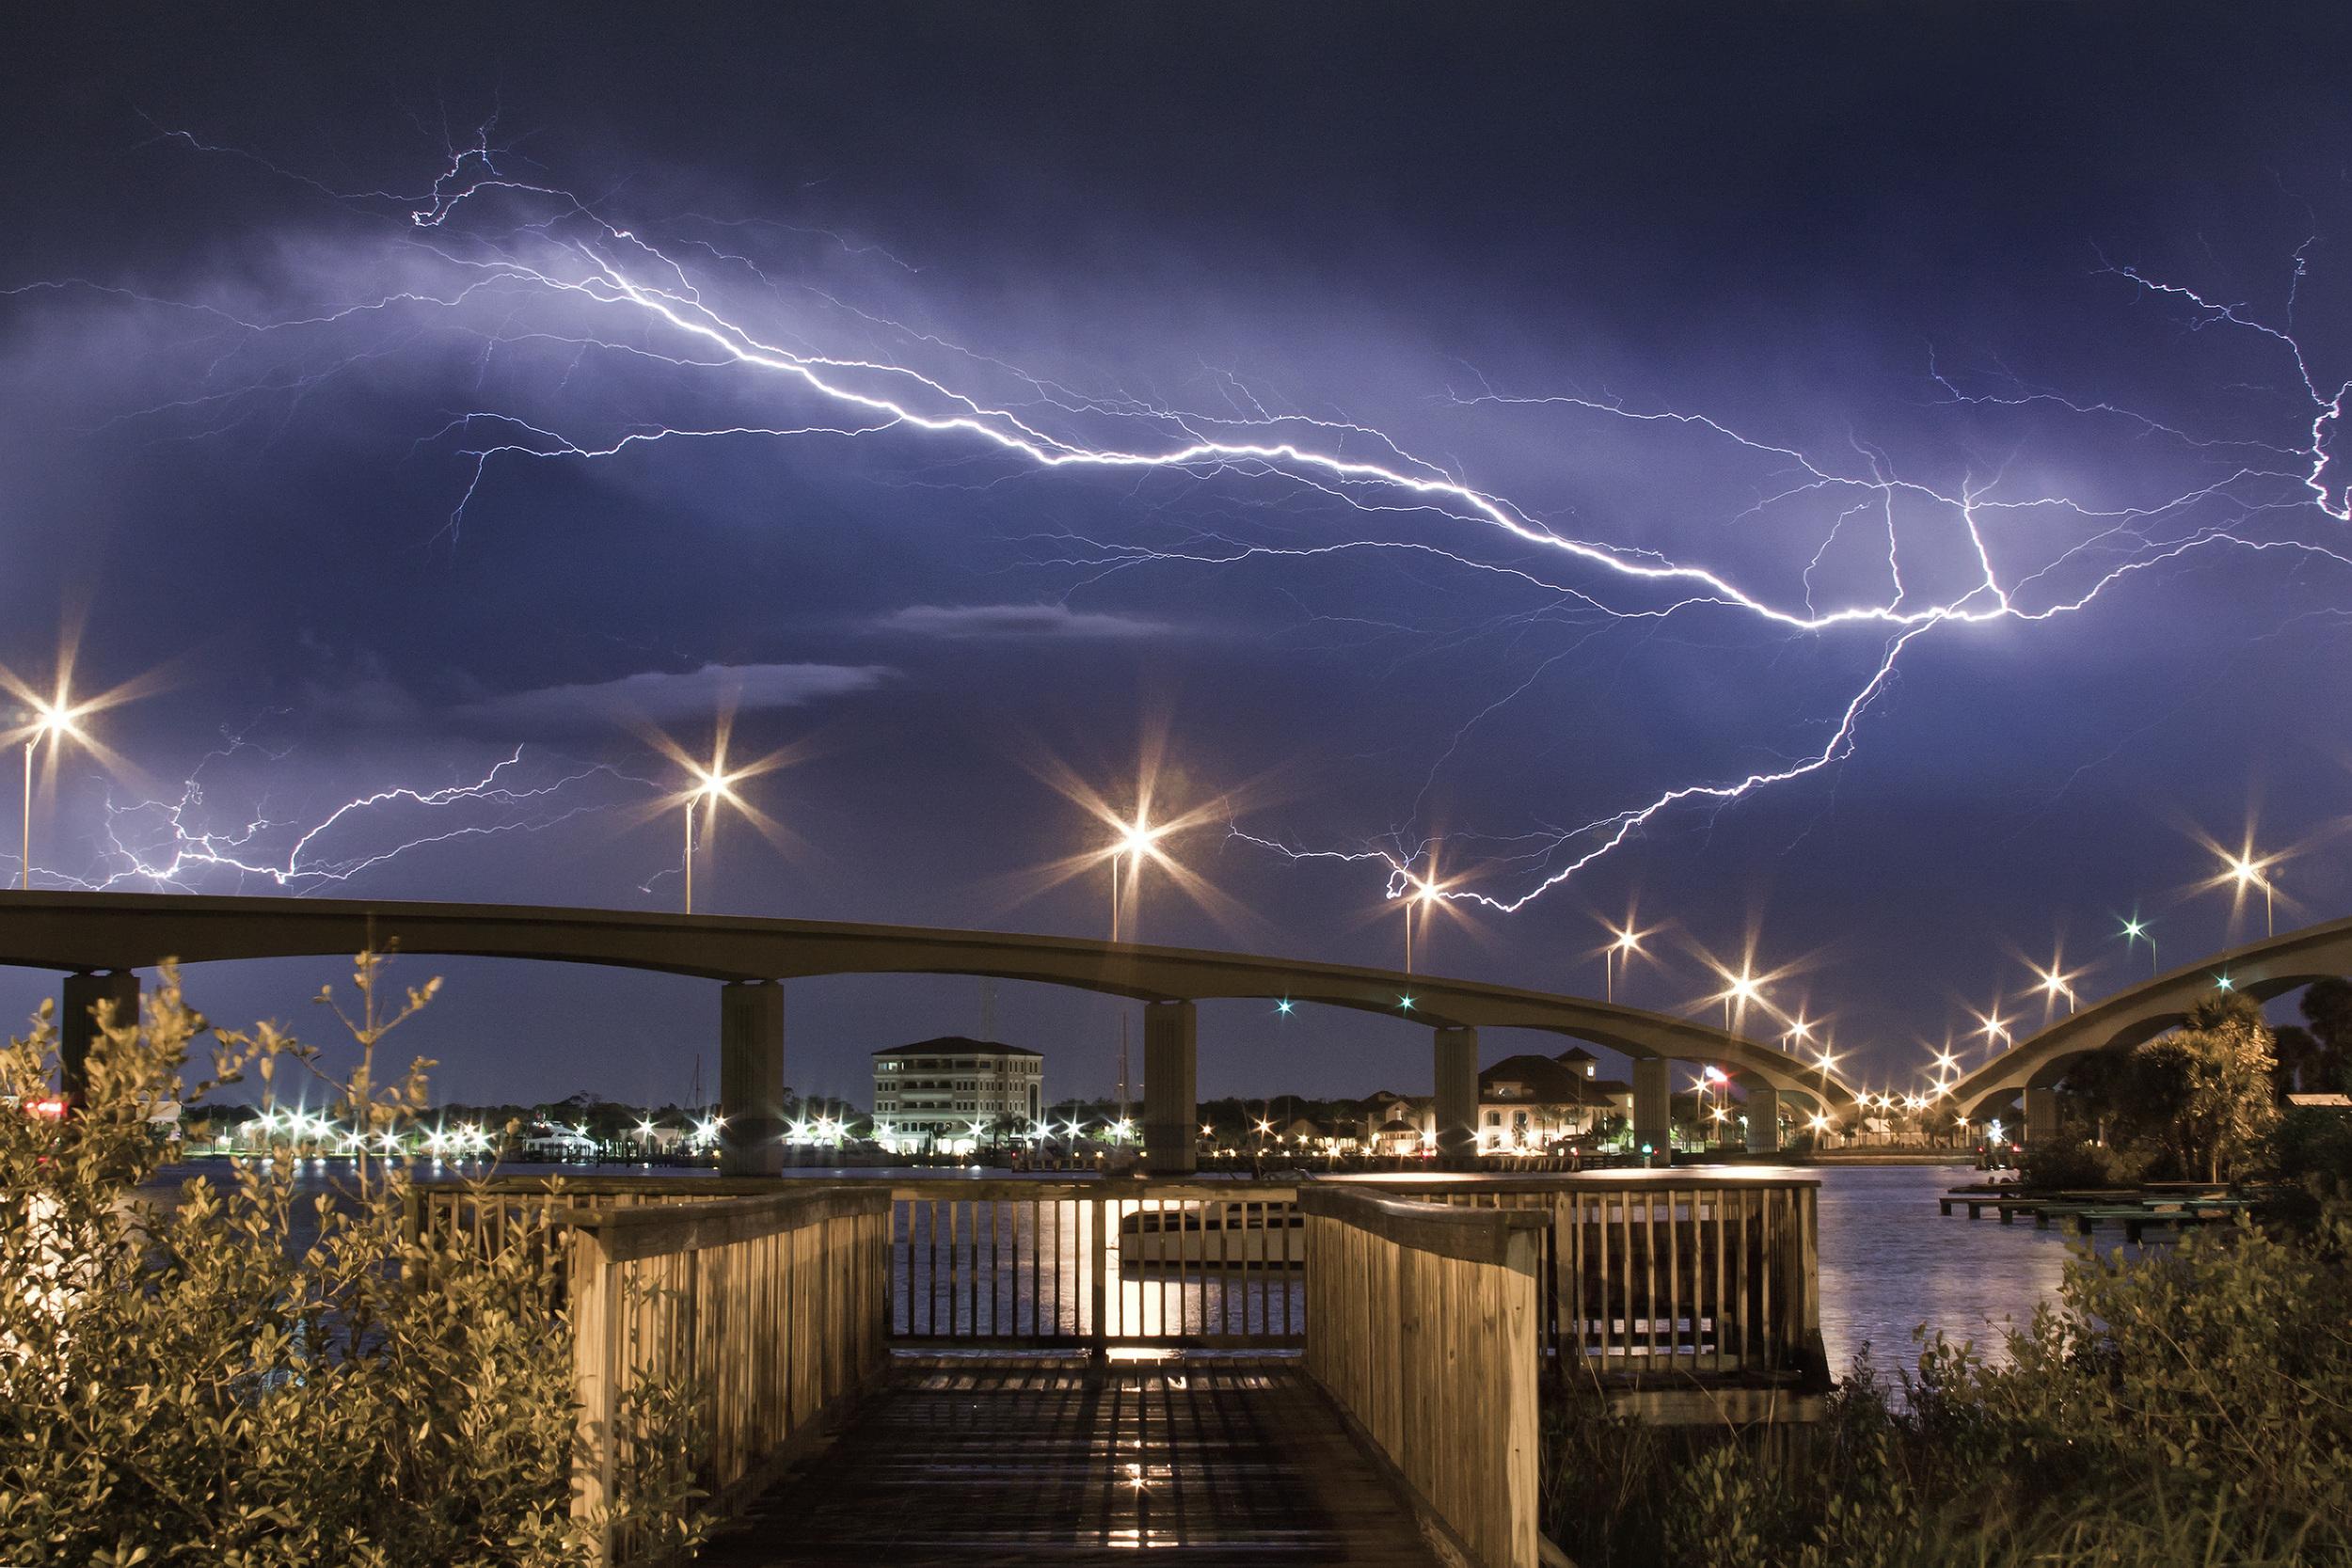 Lightning over the Seabreeze Bridge in Daytona Beach, Florida on April 25, 2010